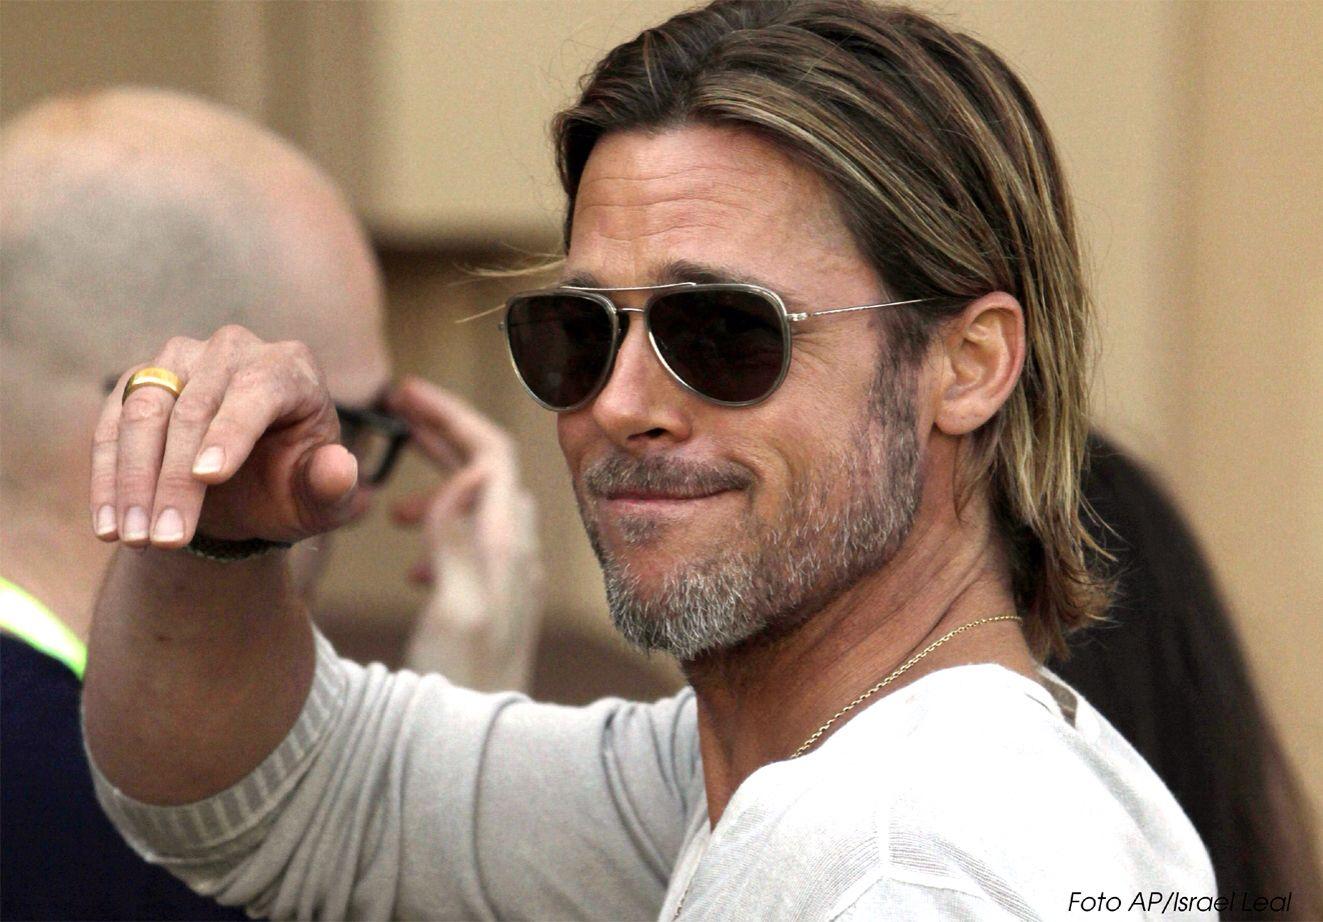 Haircuts for long hair mens brad pitt  hott guys   pinterest  brad pitt brad pitt hair